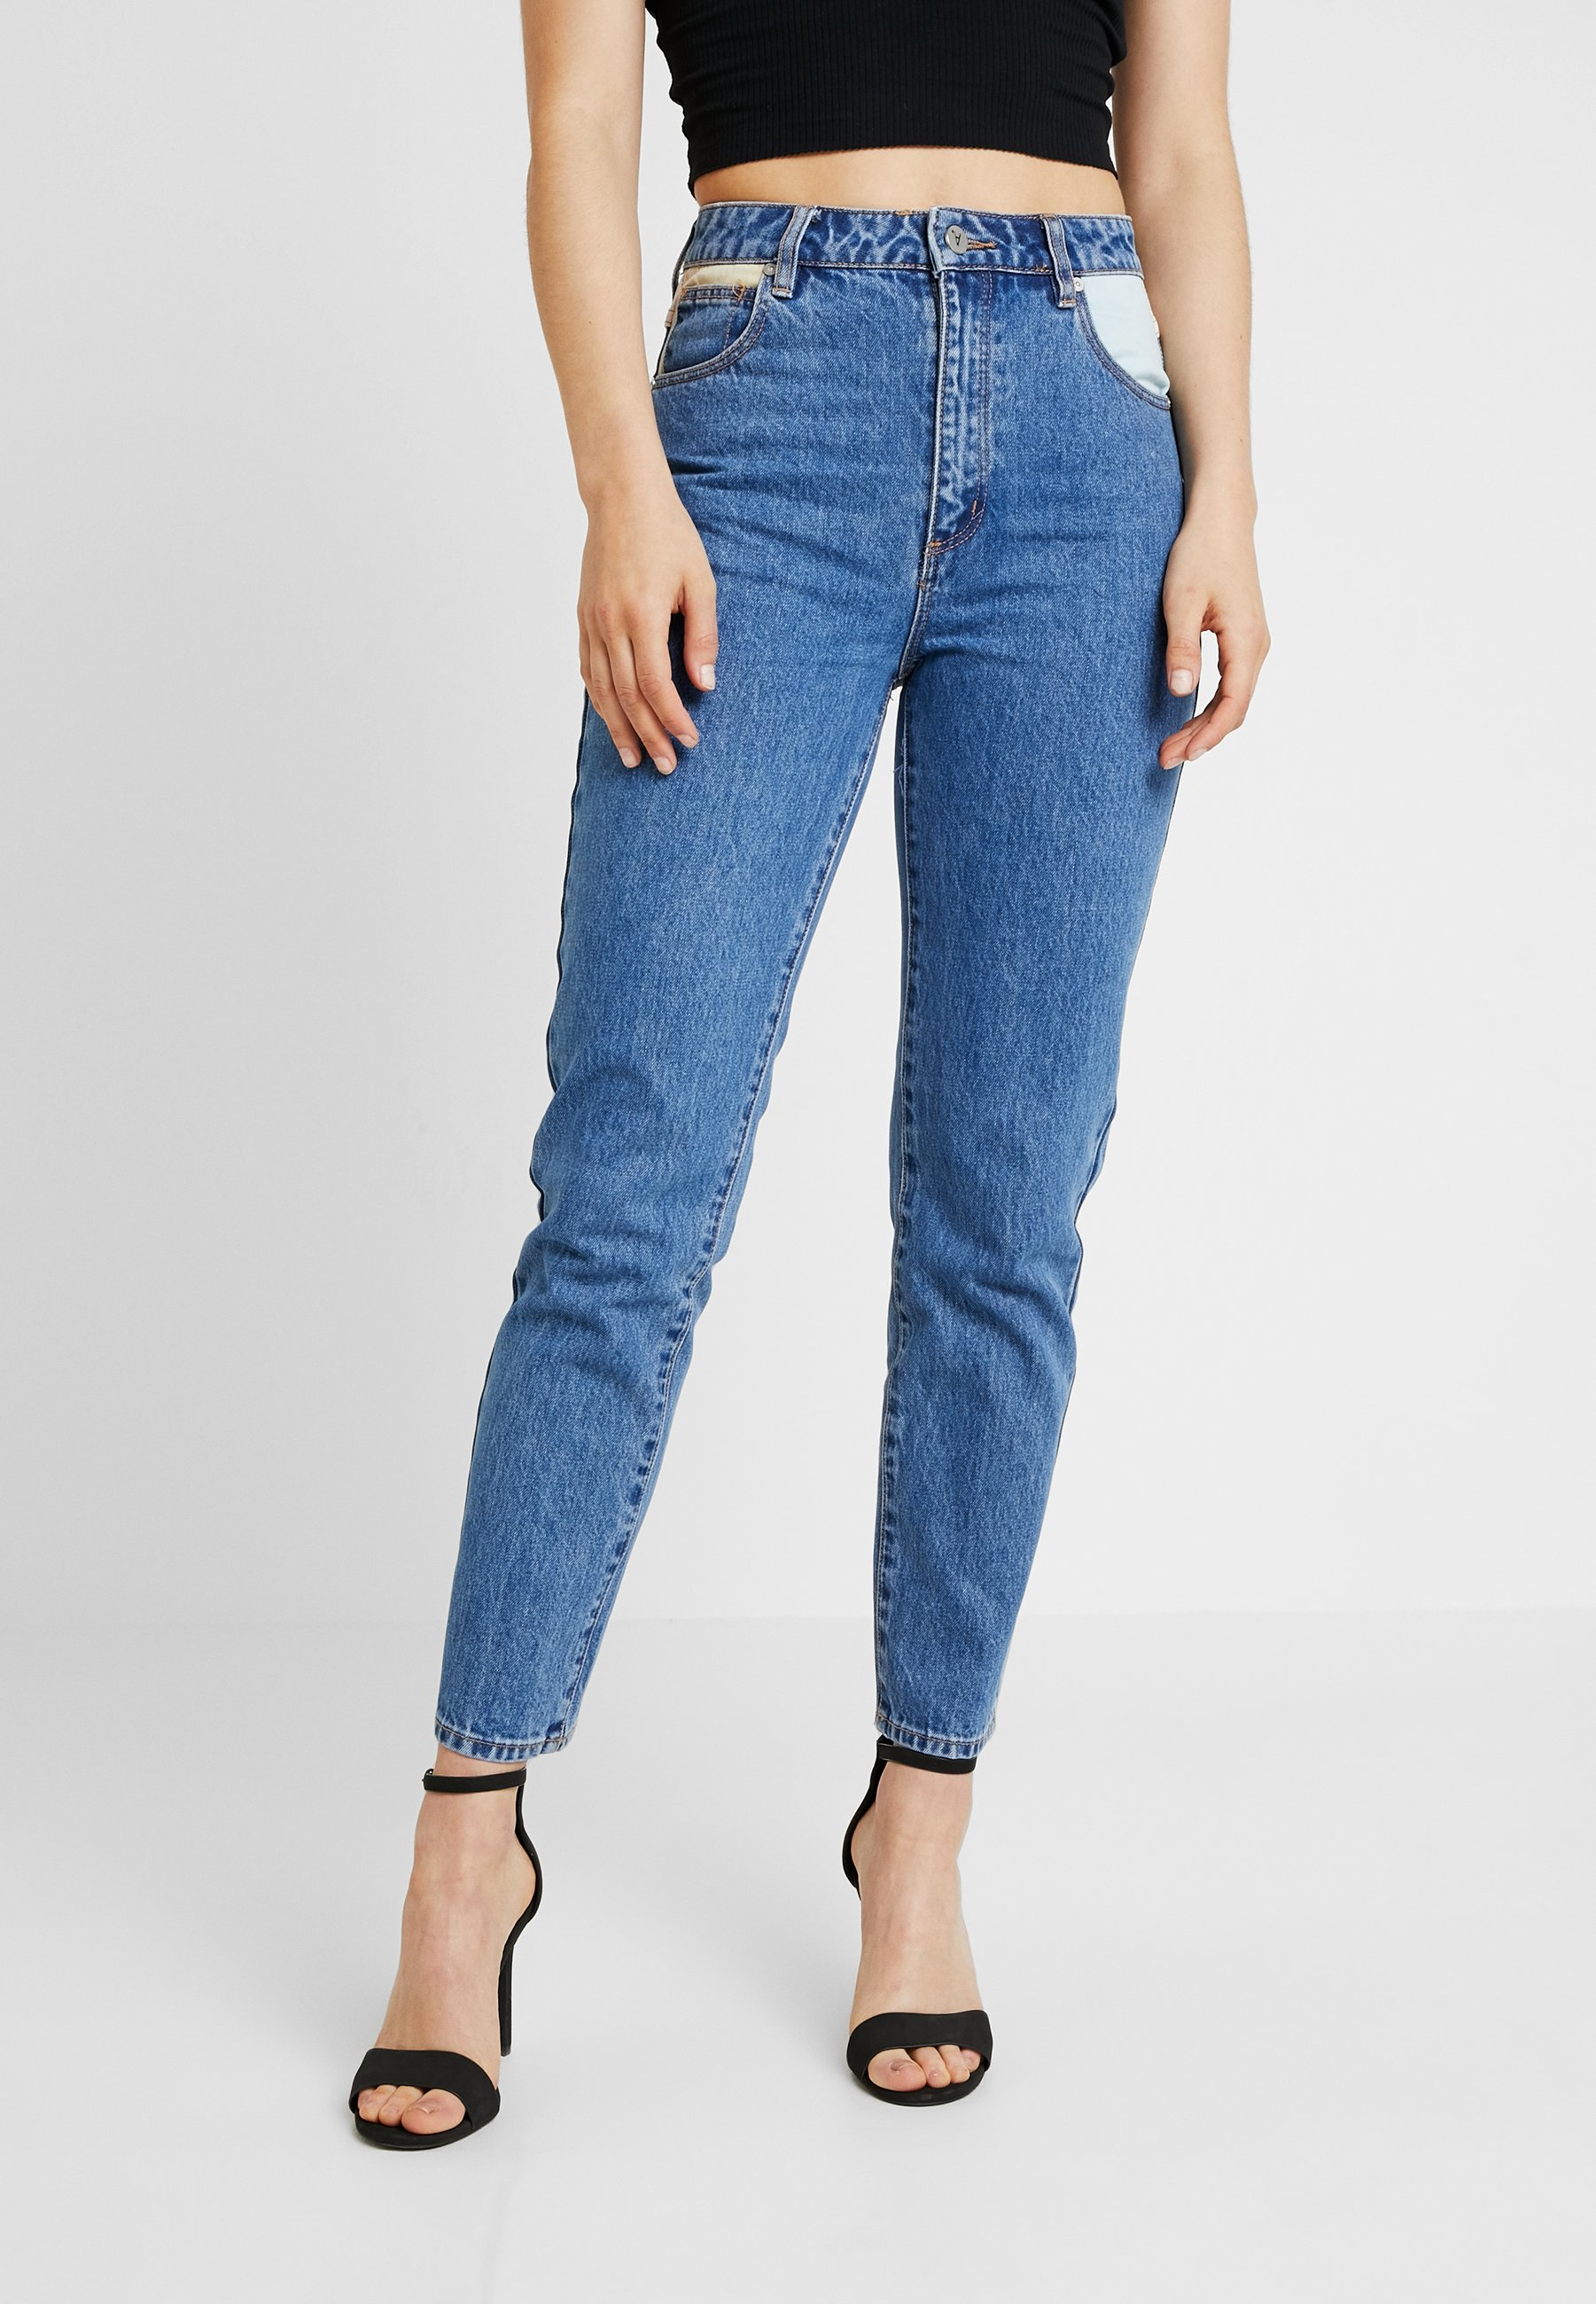 Fresh HighA So Jeans Abrand Sigaretta nw0vNm8O